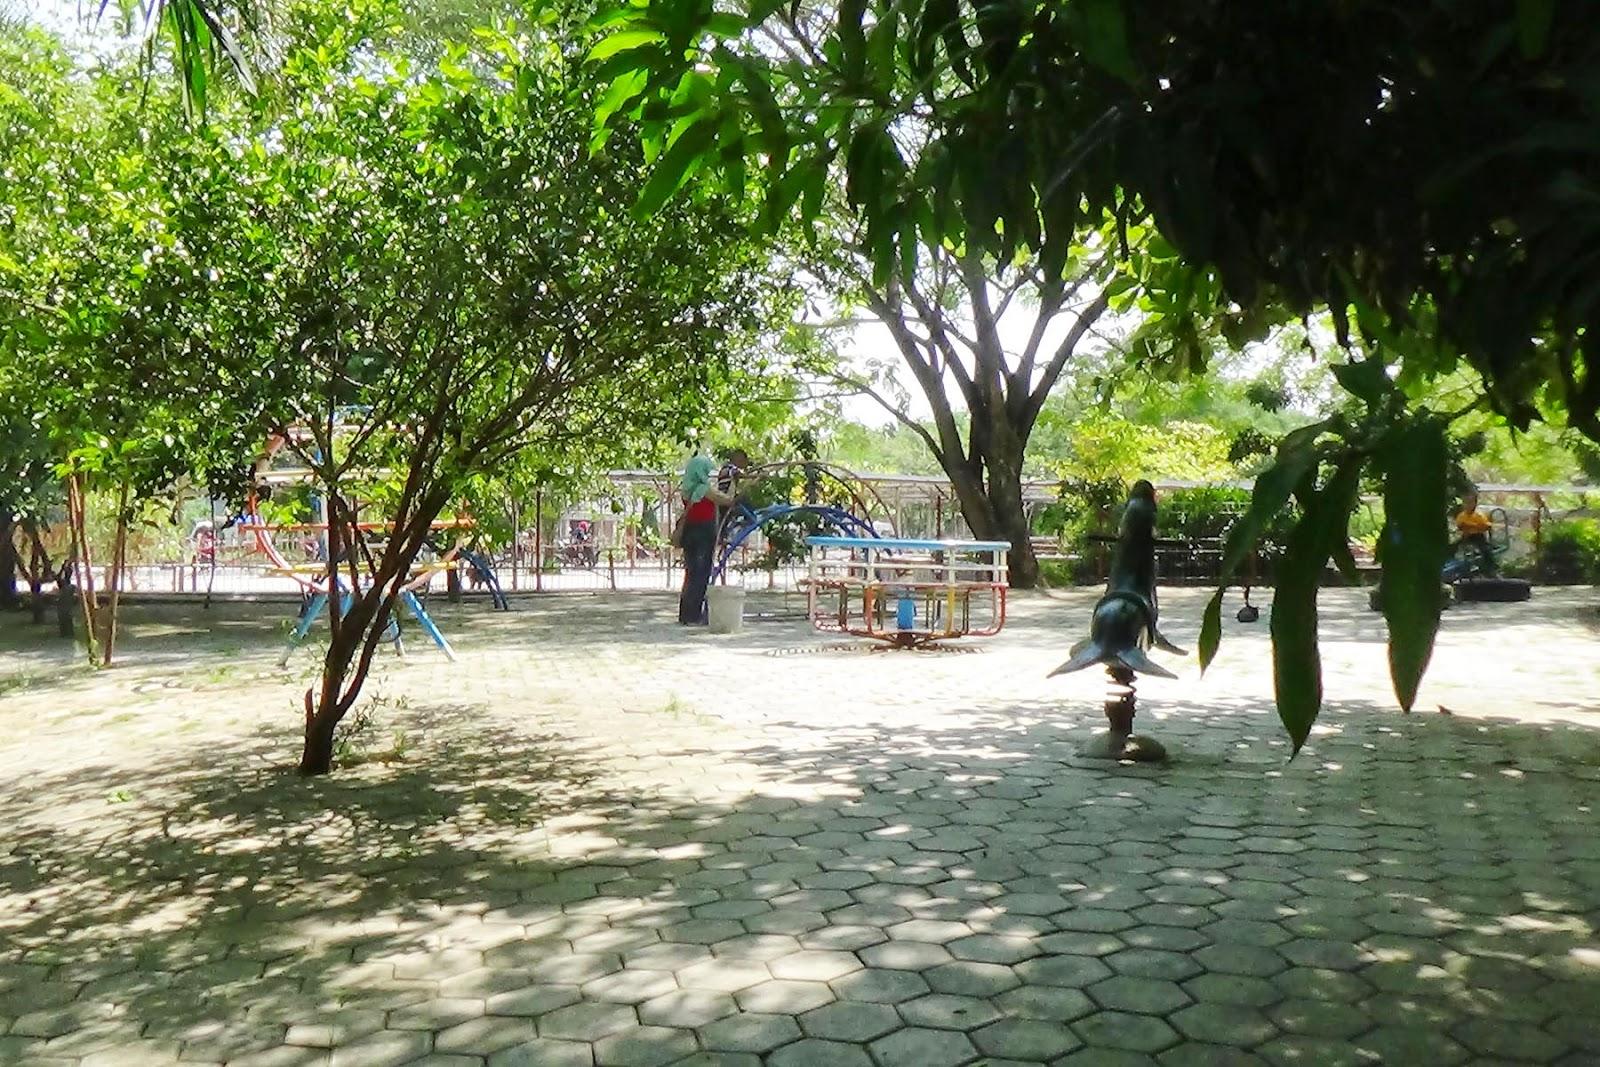 Taman Wisata Sariyo Padangan Bojonegoro Wong Kampung Disamping Lokasinya Cukup